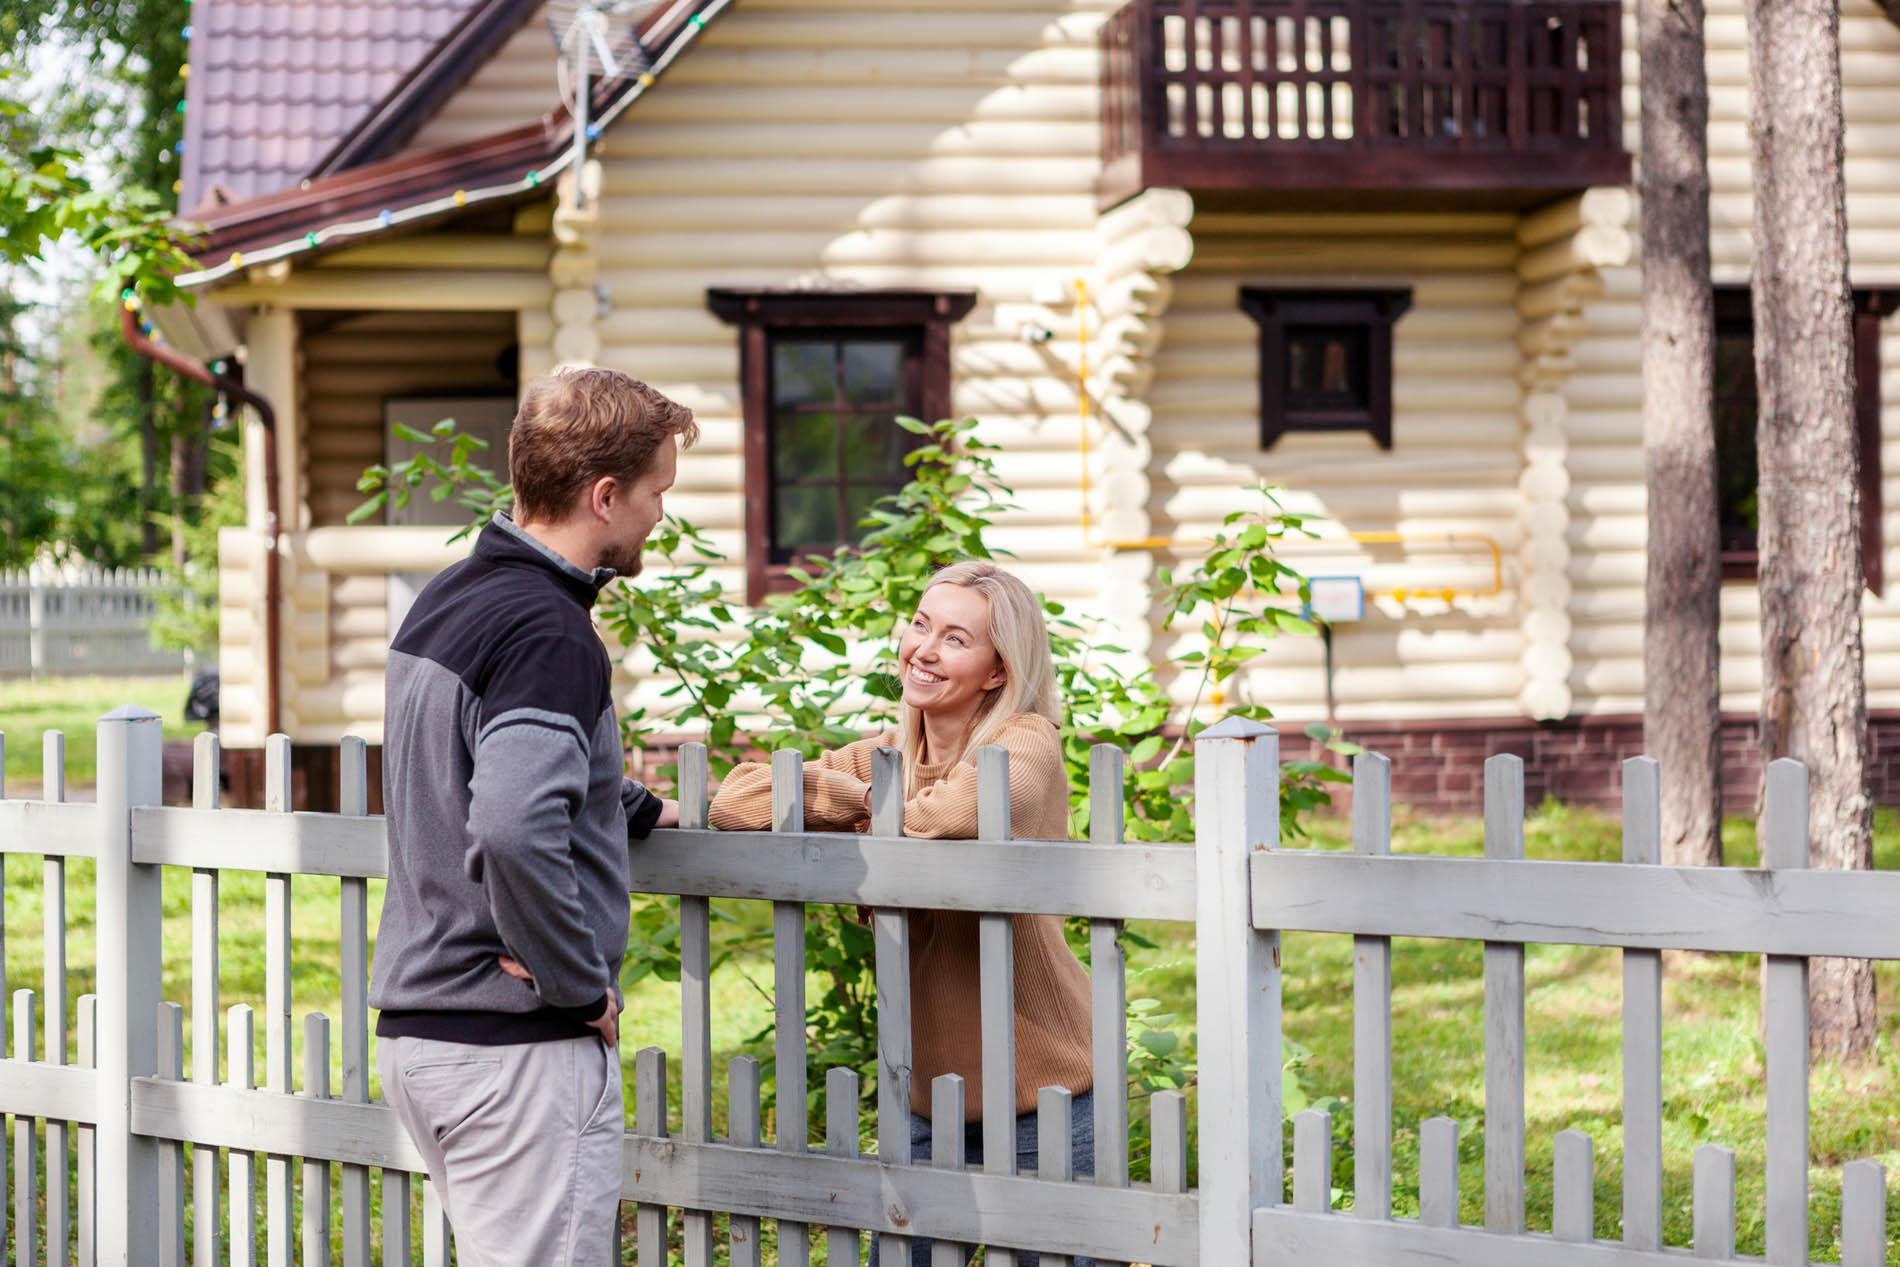 neighbors-man-woman.jpg